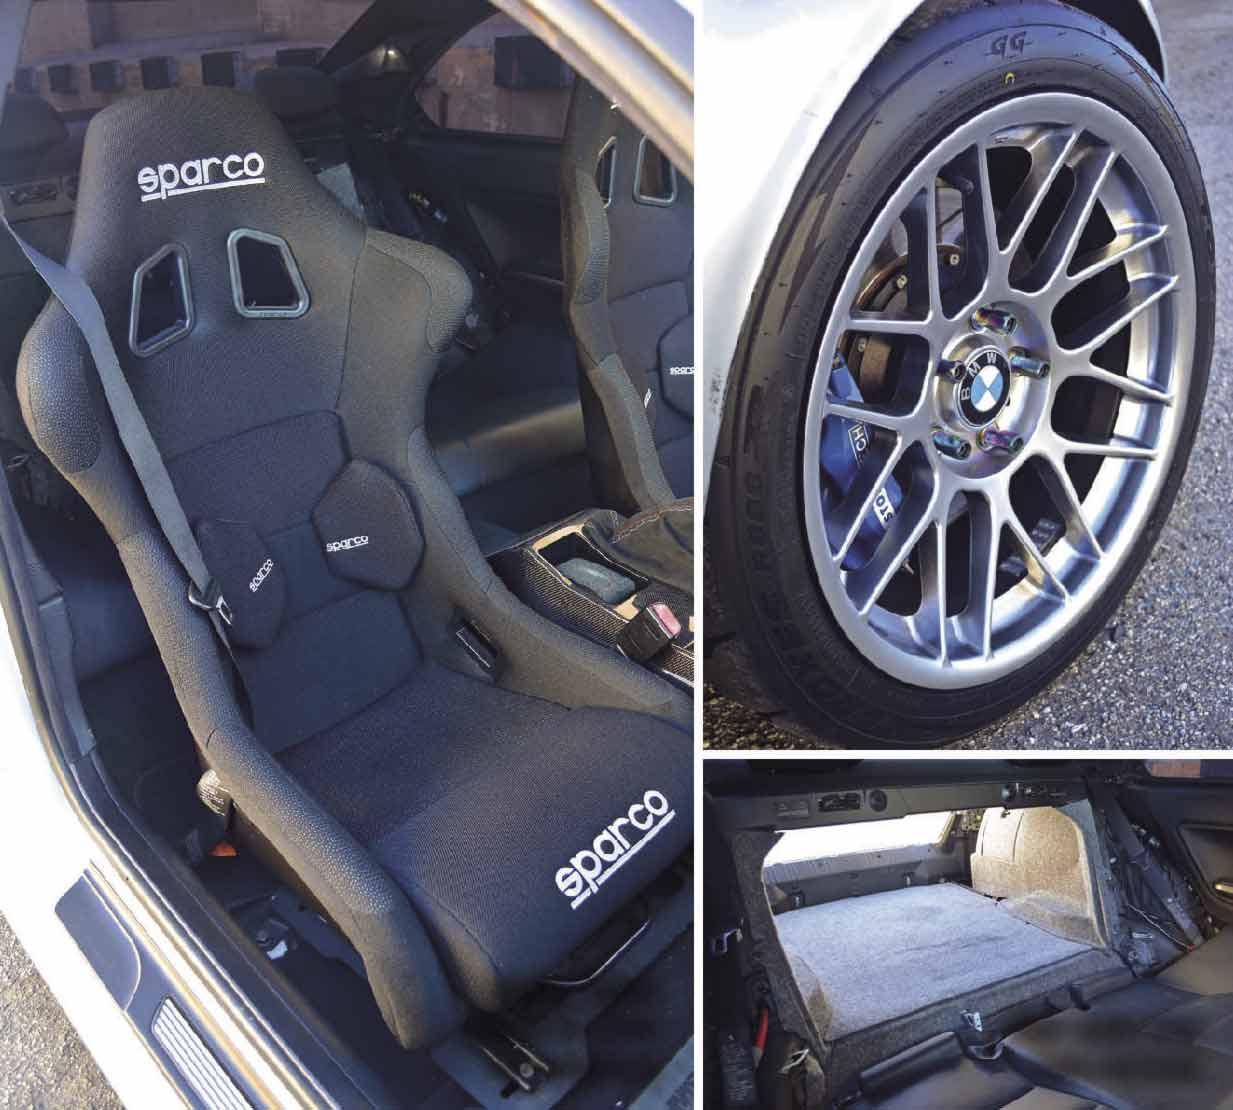 680whp turbo S54 BMW M3 E46 - Drive-My Blogs - Drive